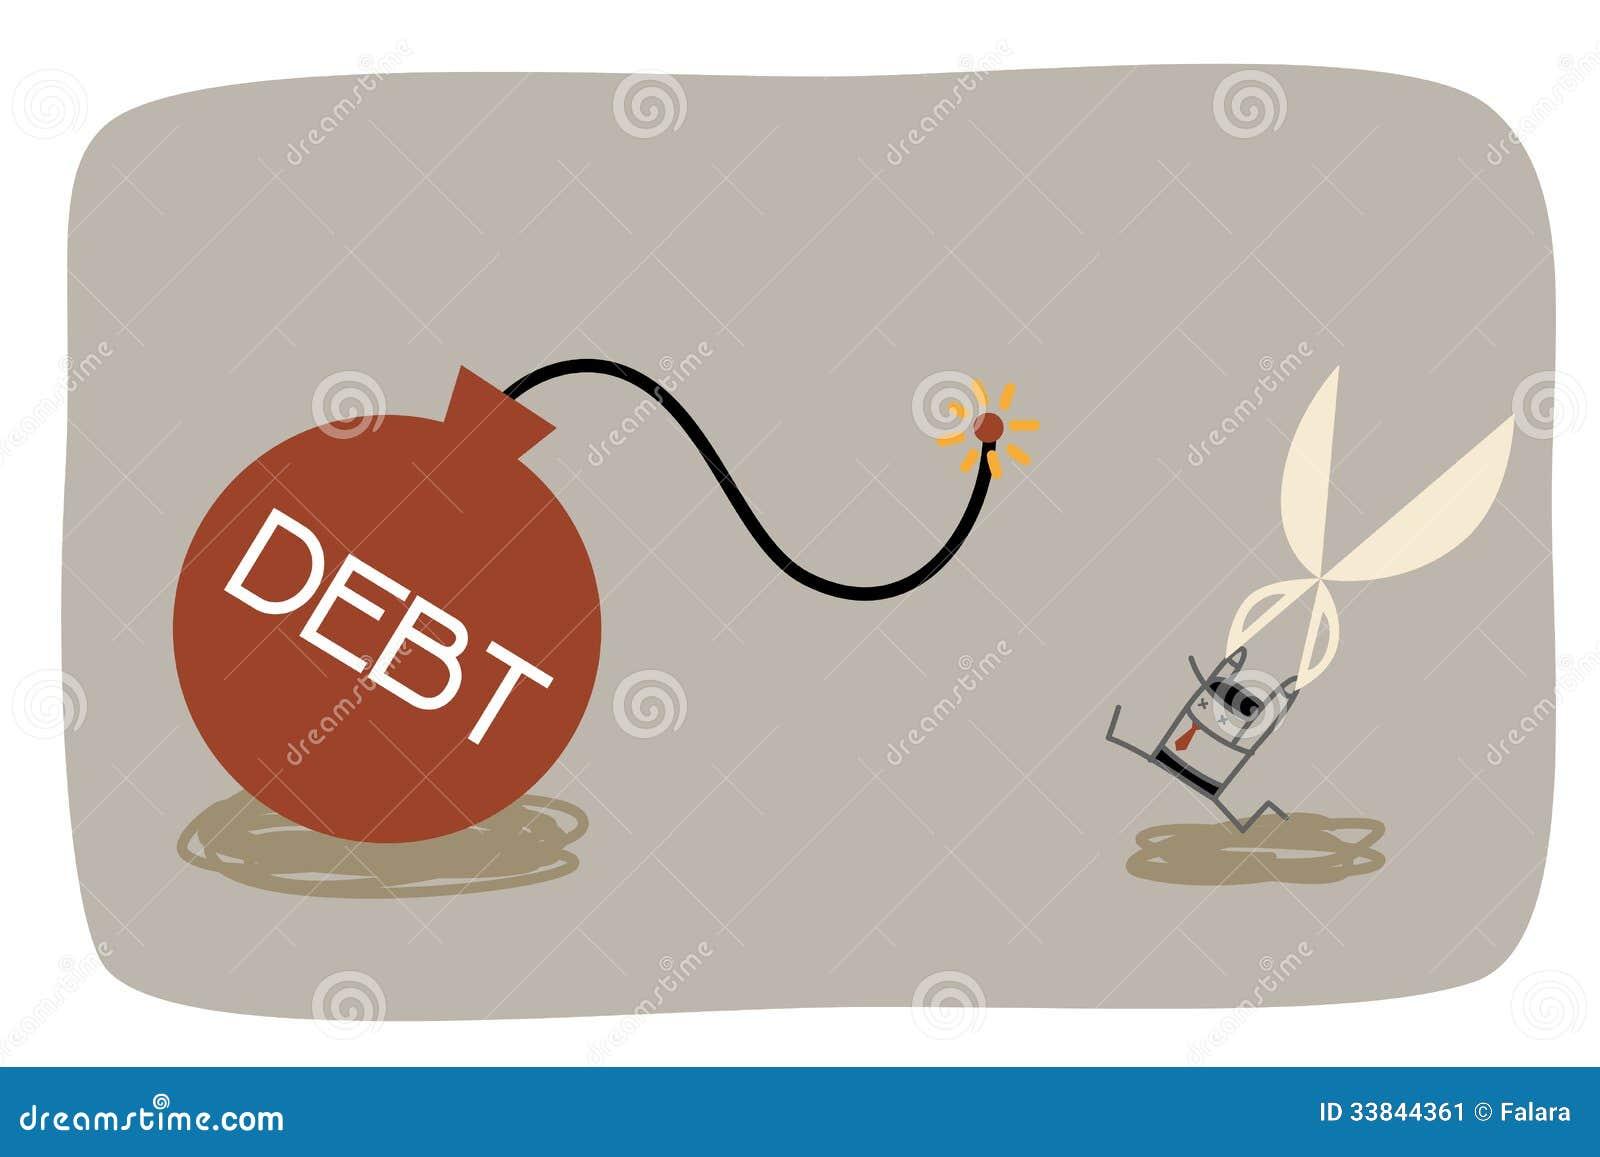 debt management plan for business